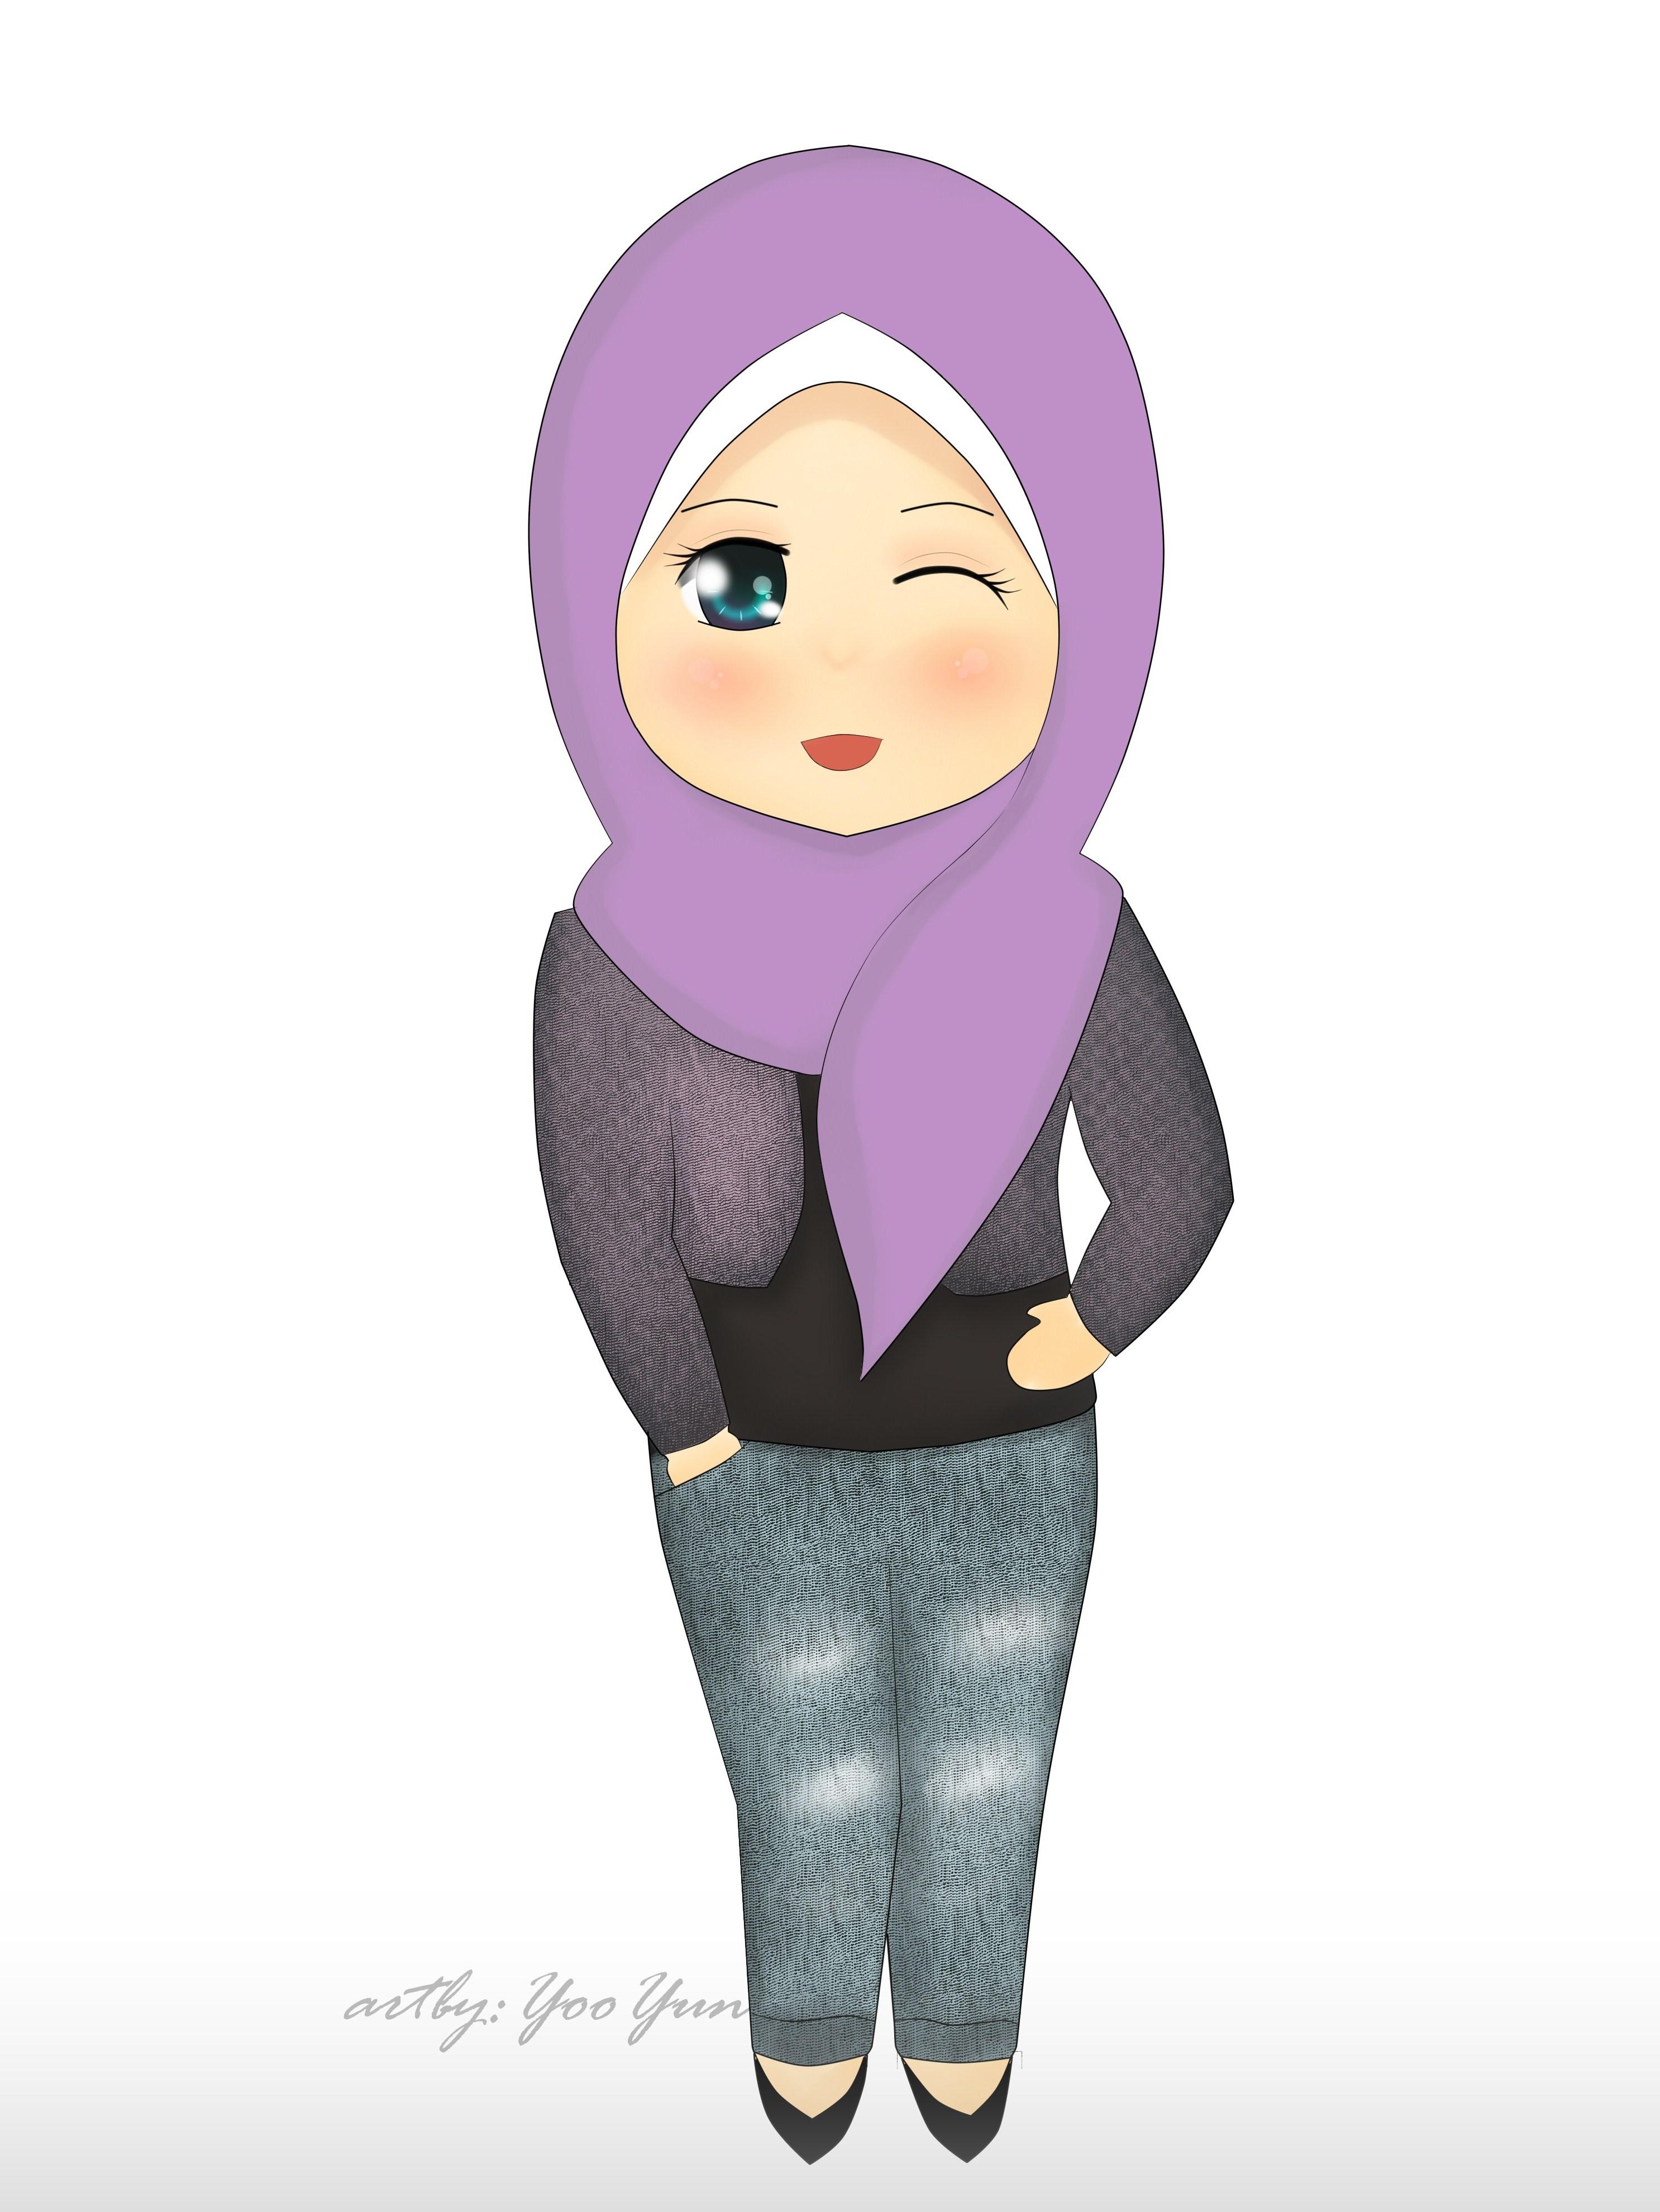 71 Koleksi Gambar Kartun Anak Muslimah Gratis